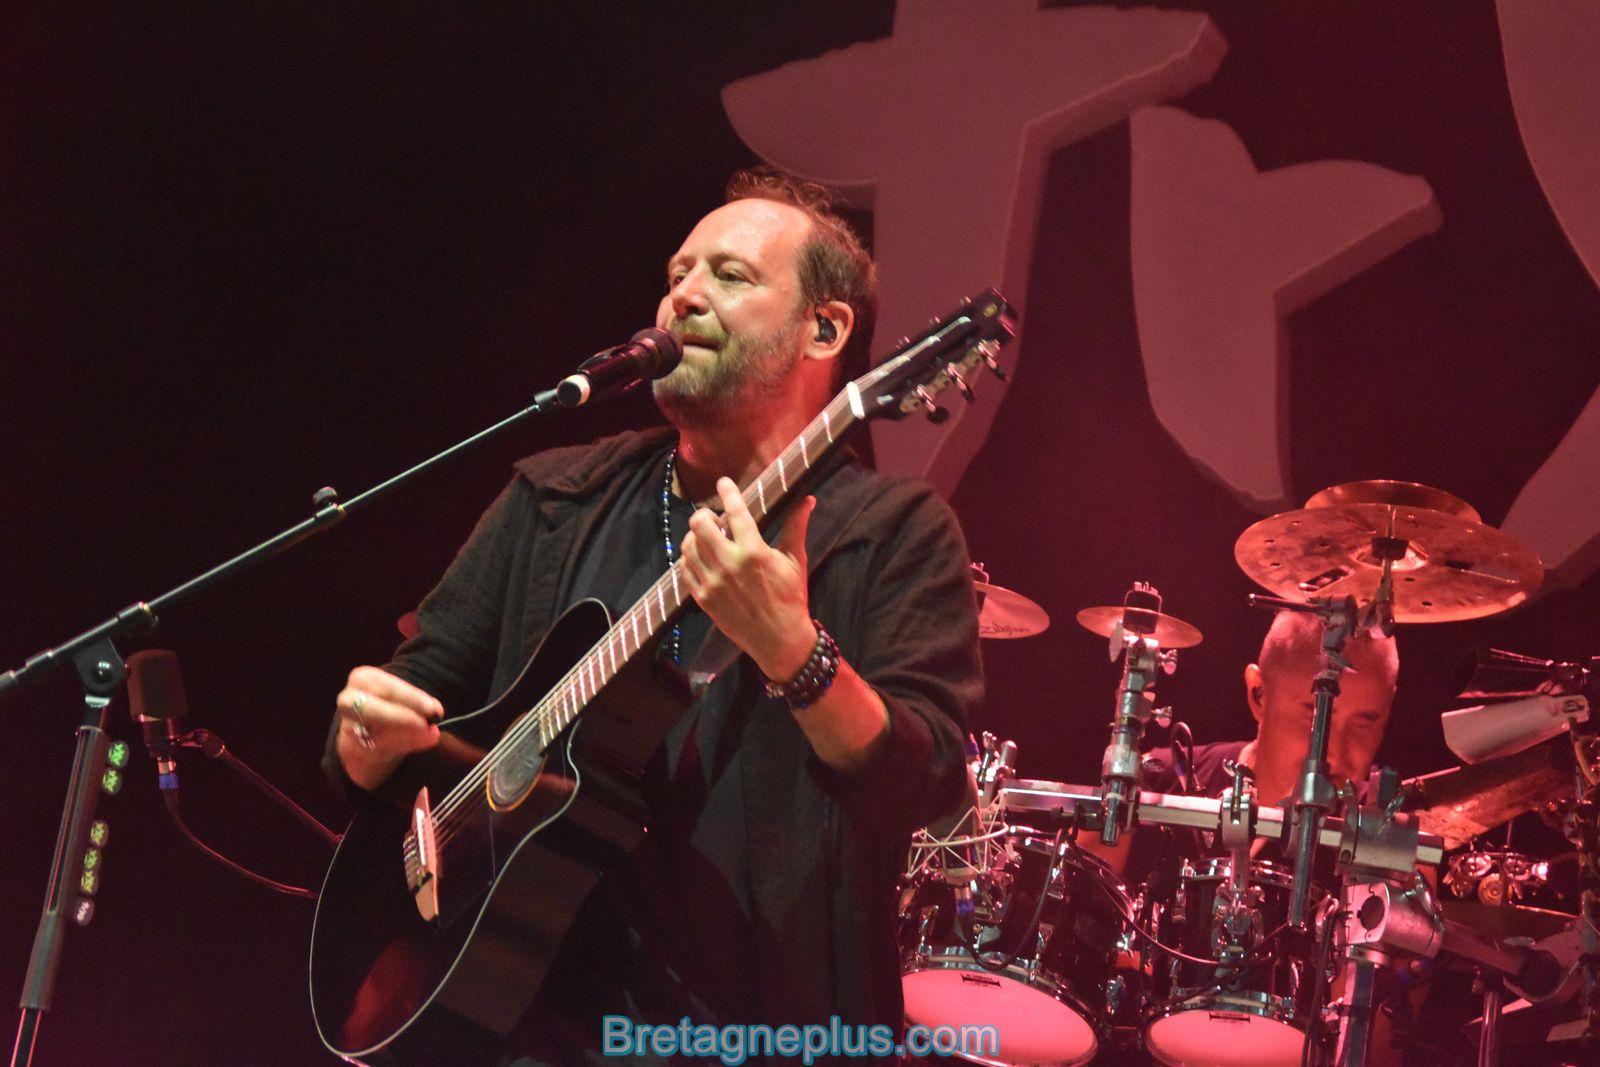 TRYO en concert à Combourg